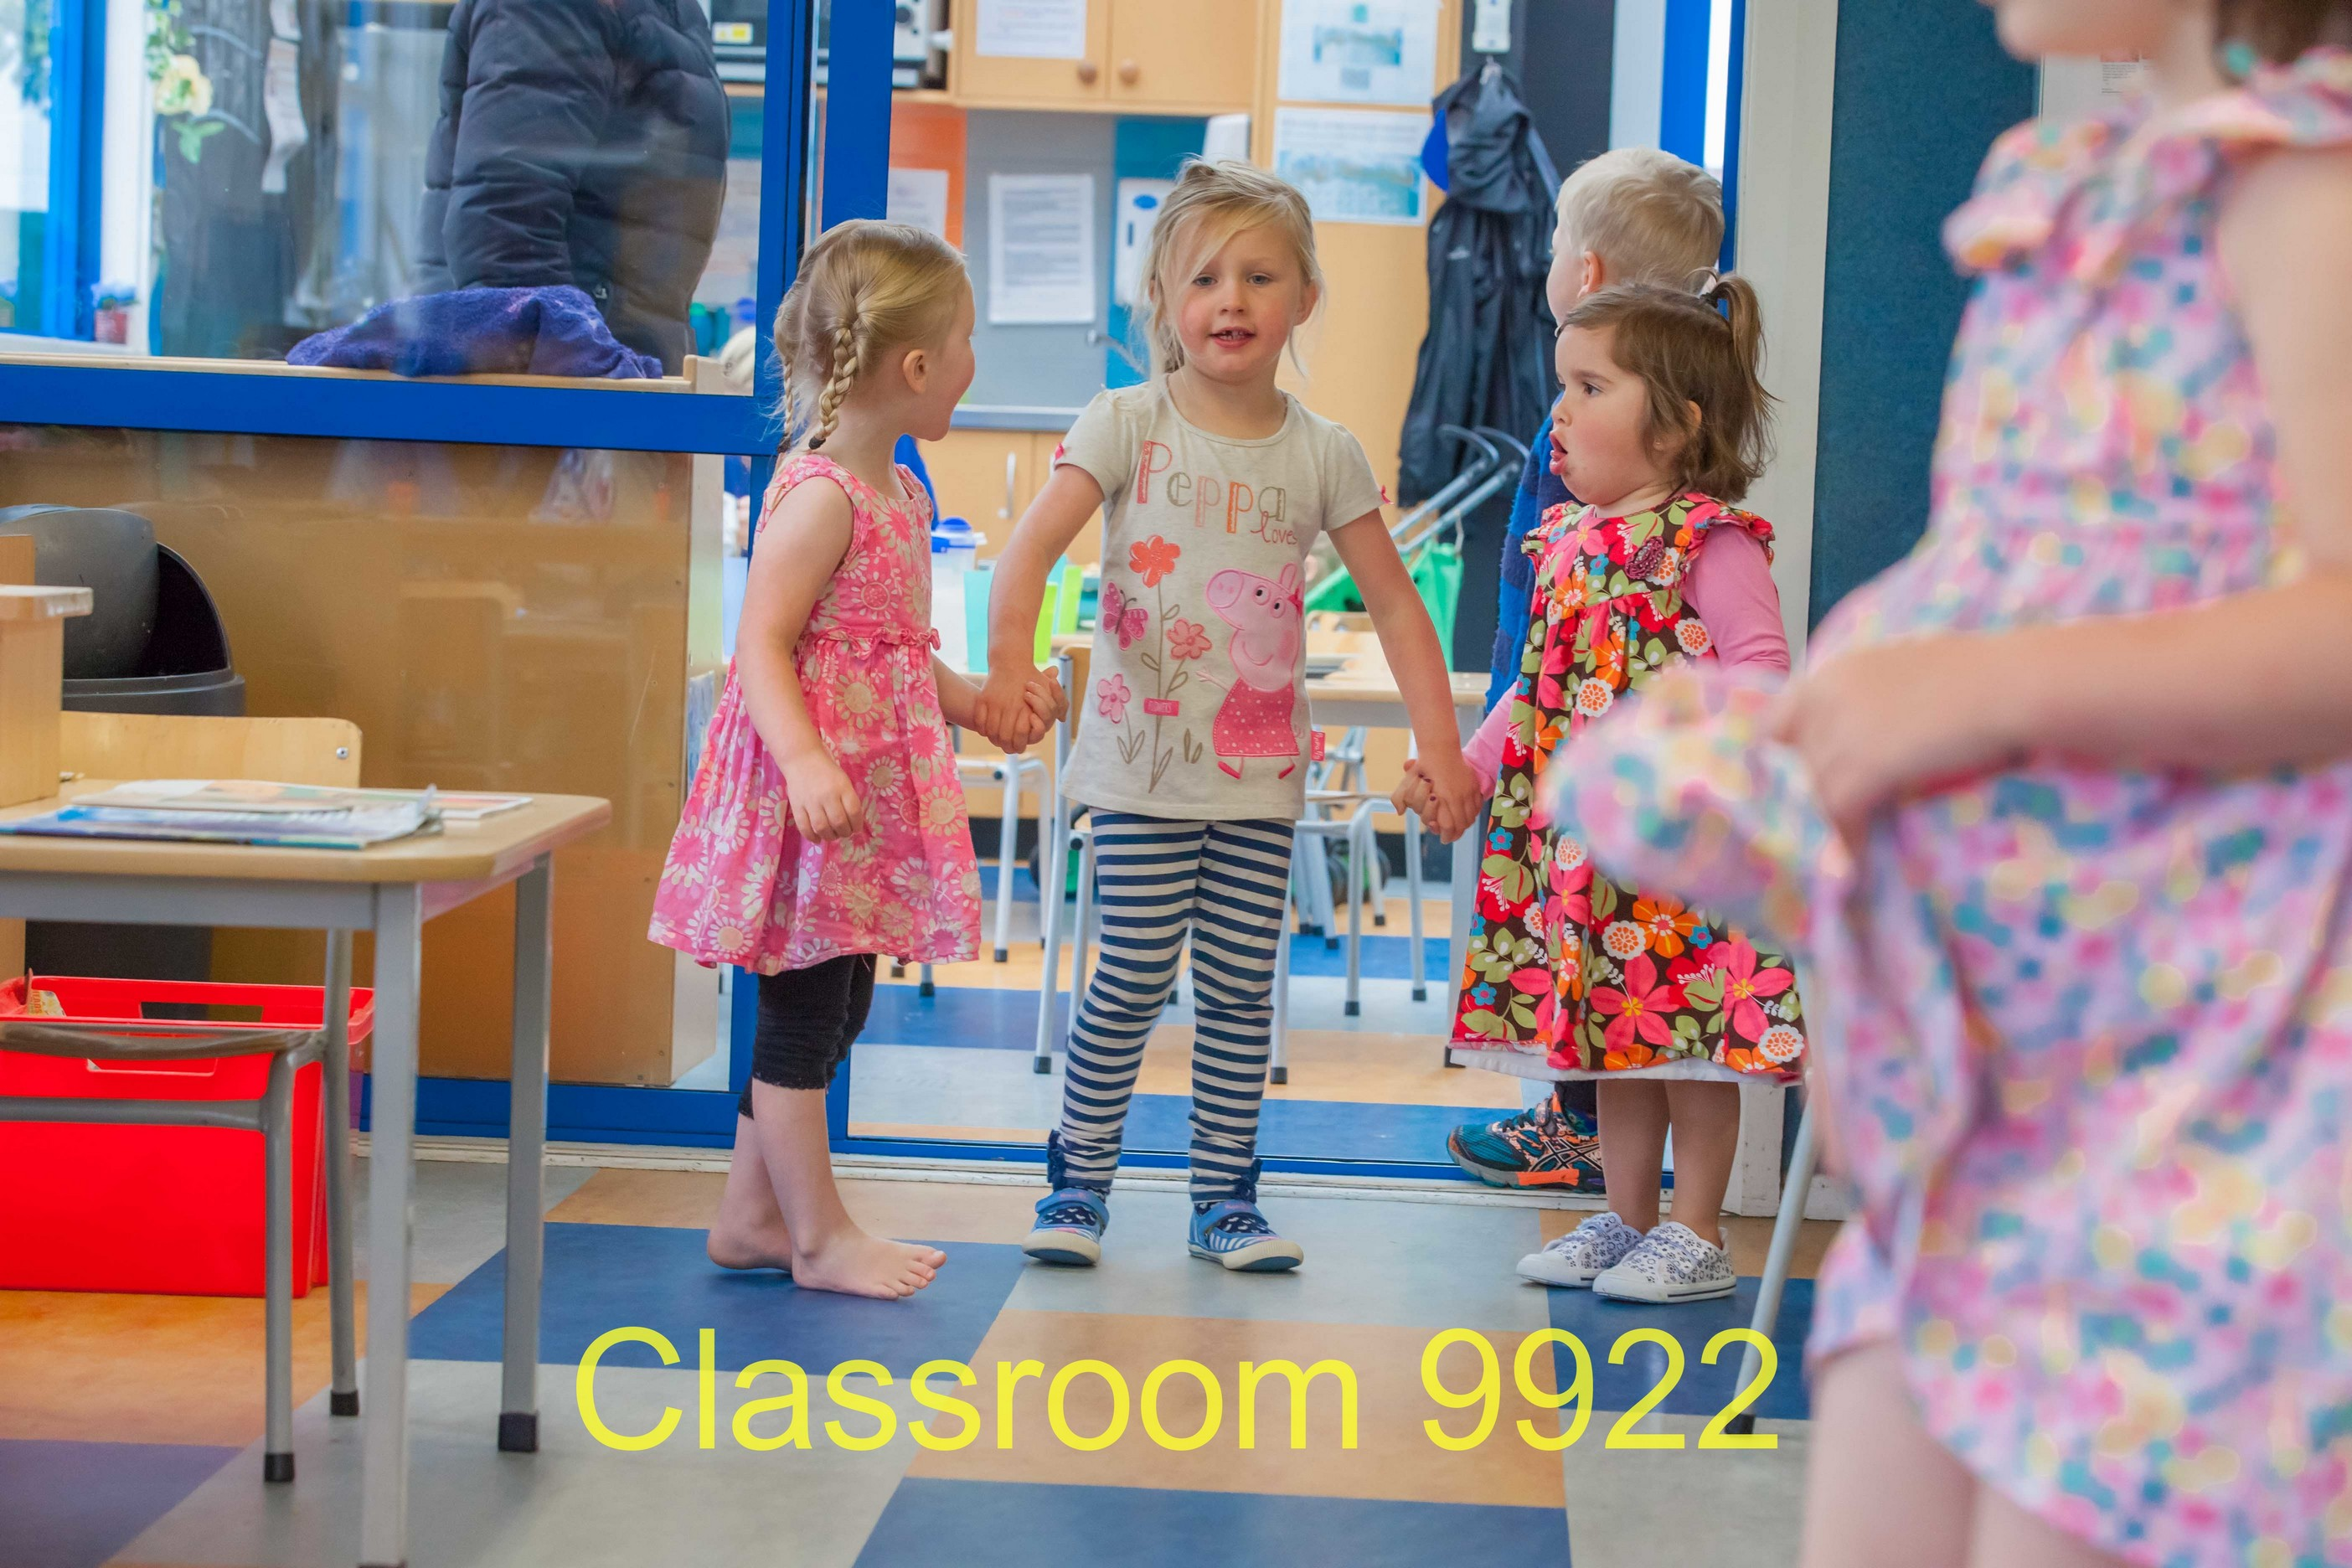 Classroom 9922